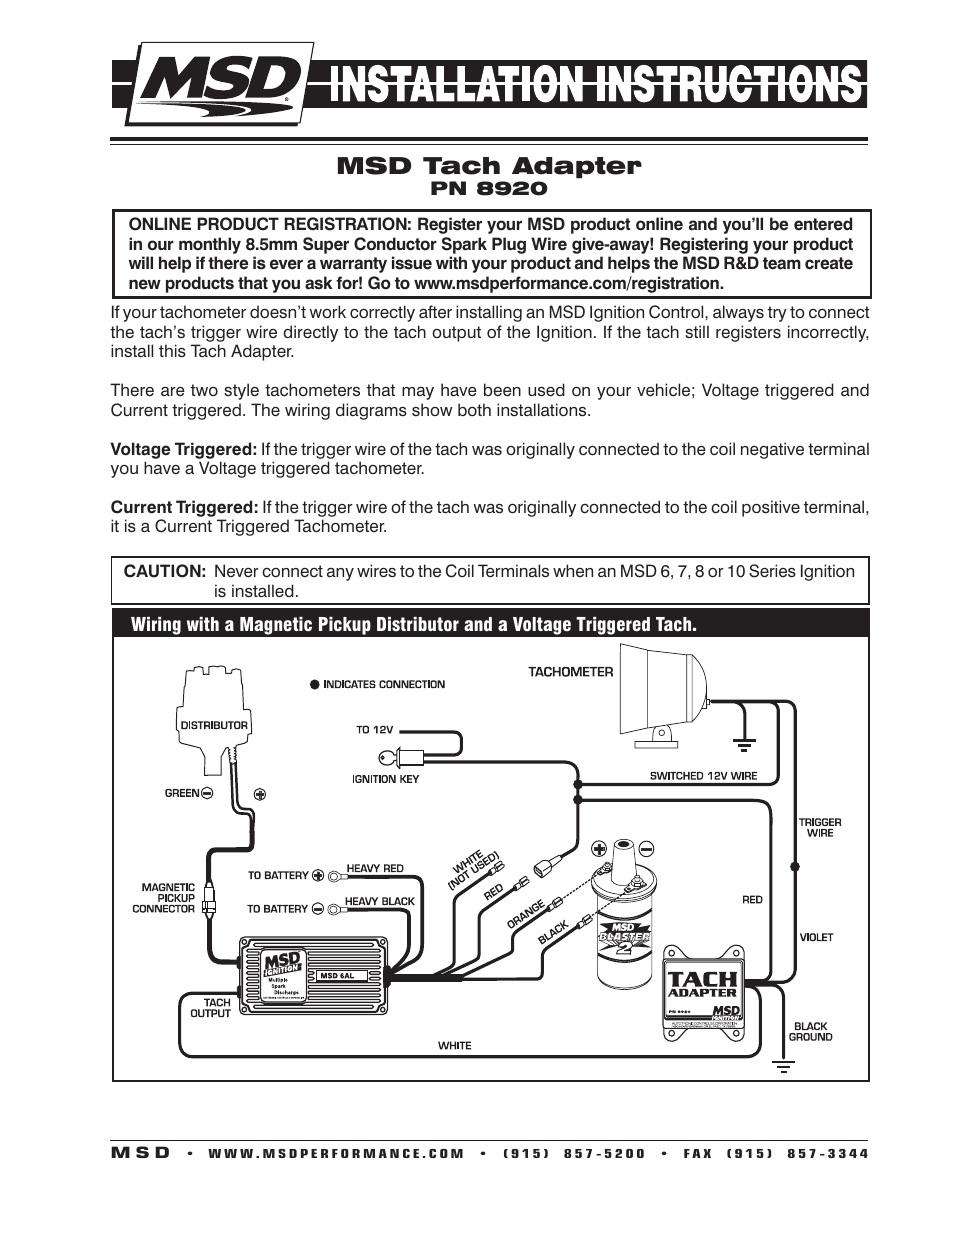 Goodall Wiring Diagrams